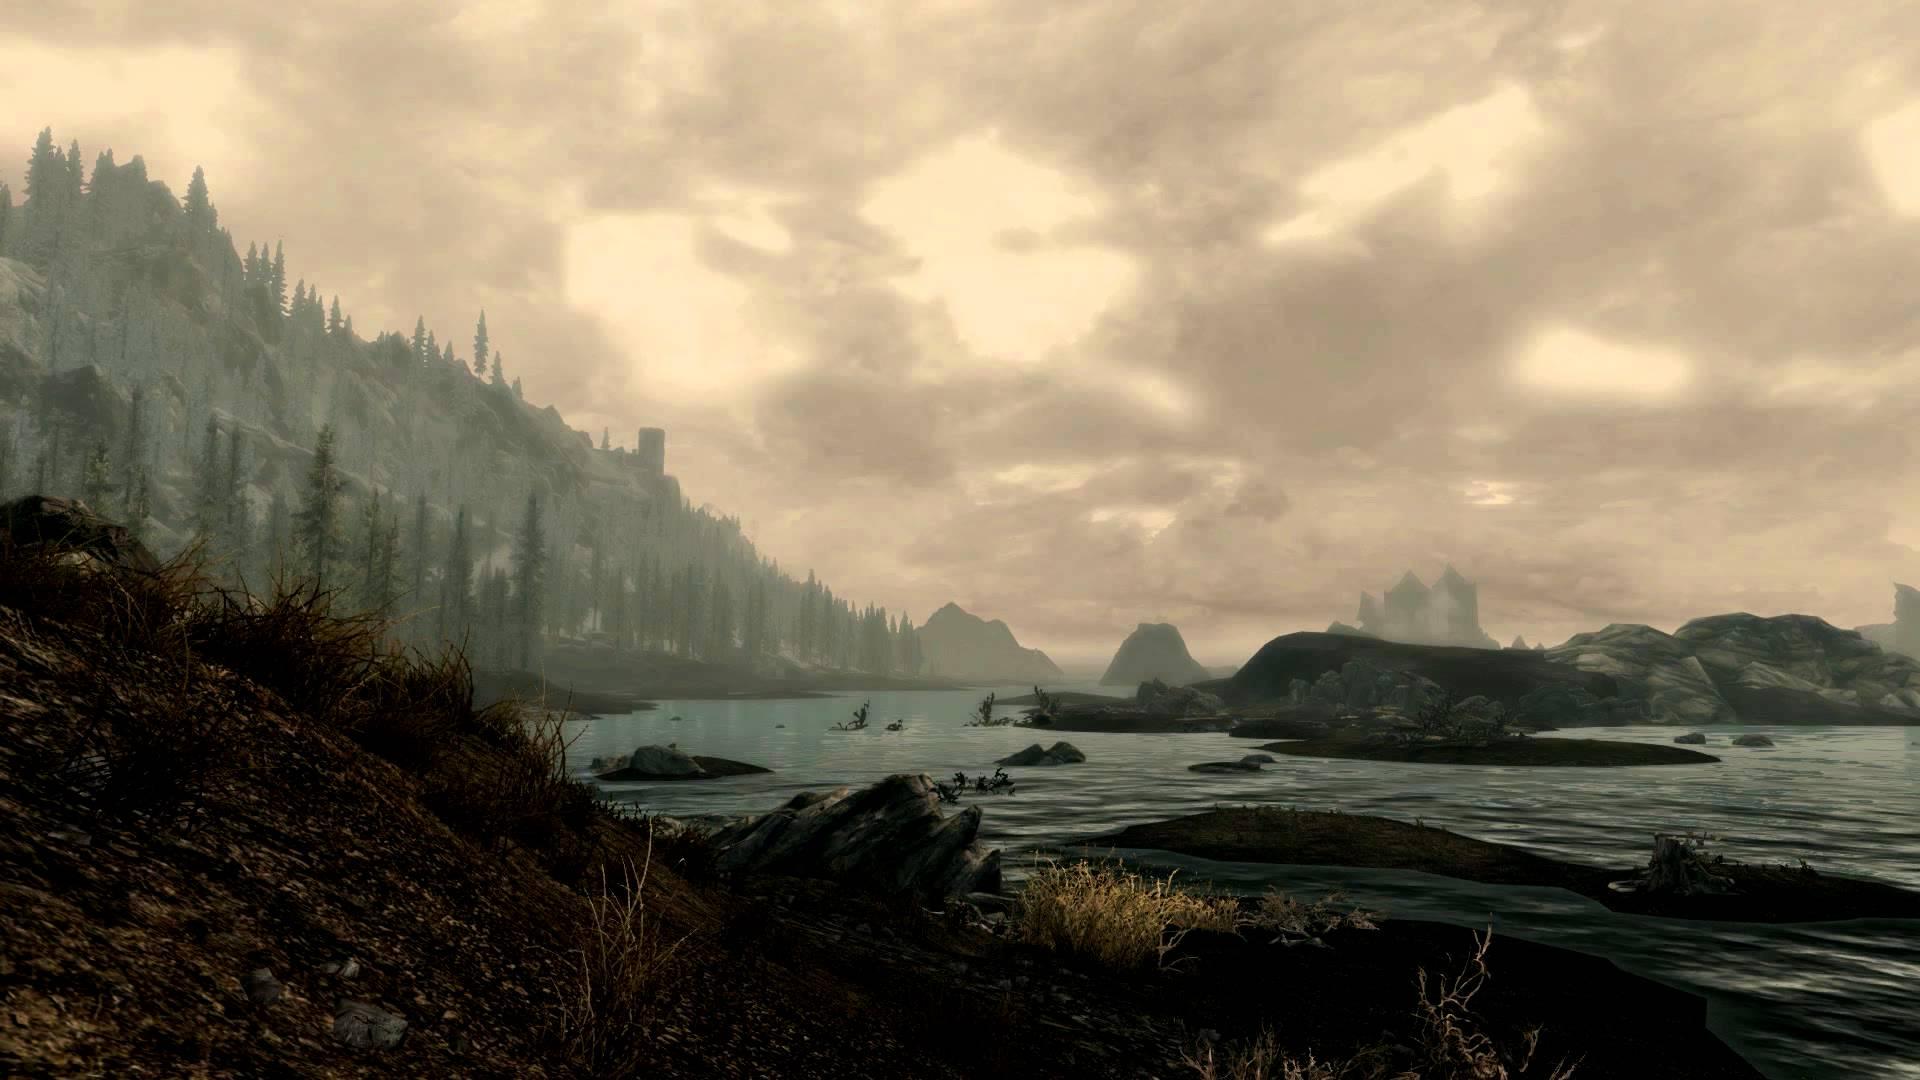 Skyrim Beautiful Shoreline 3 Dreamscene Video Desktop Wallpaper 1920x1080